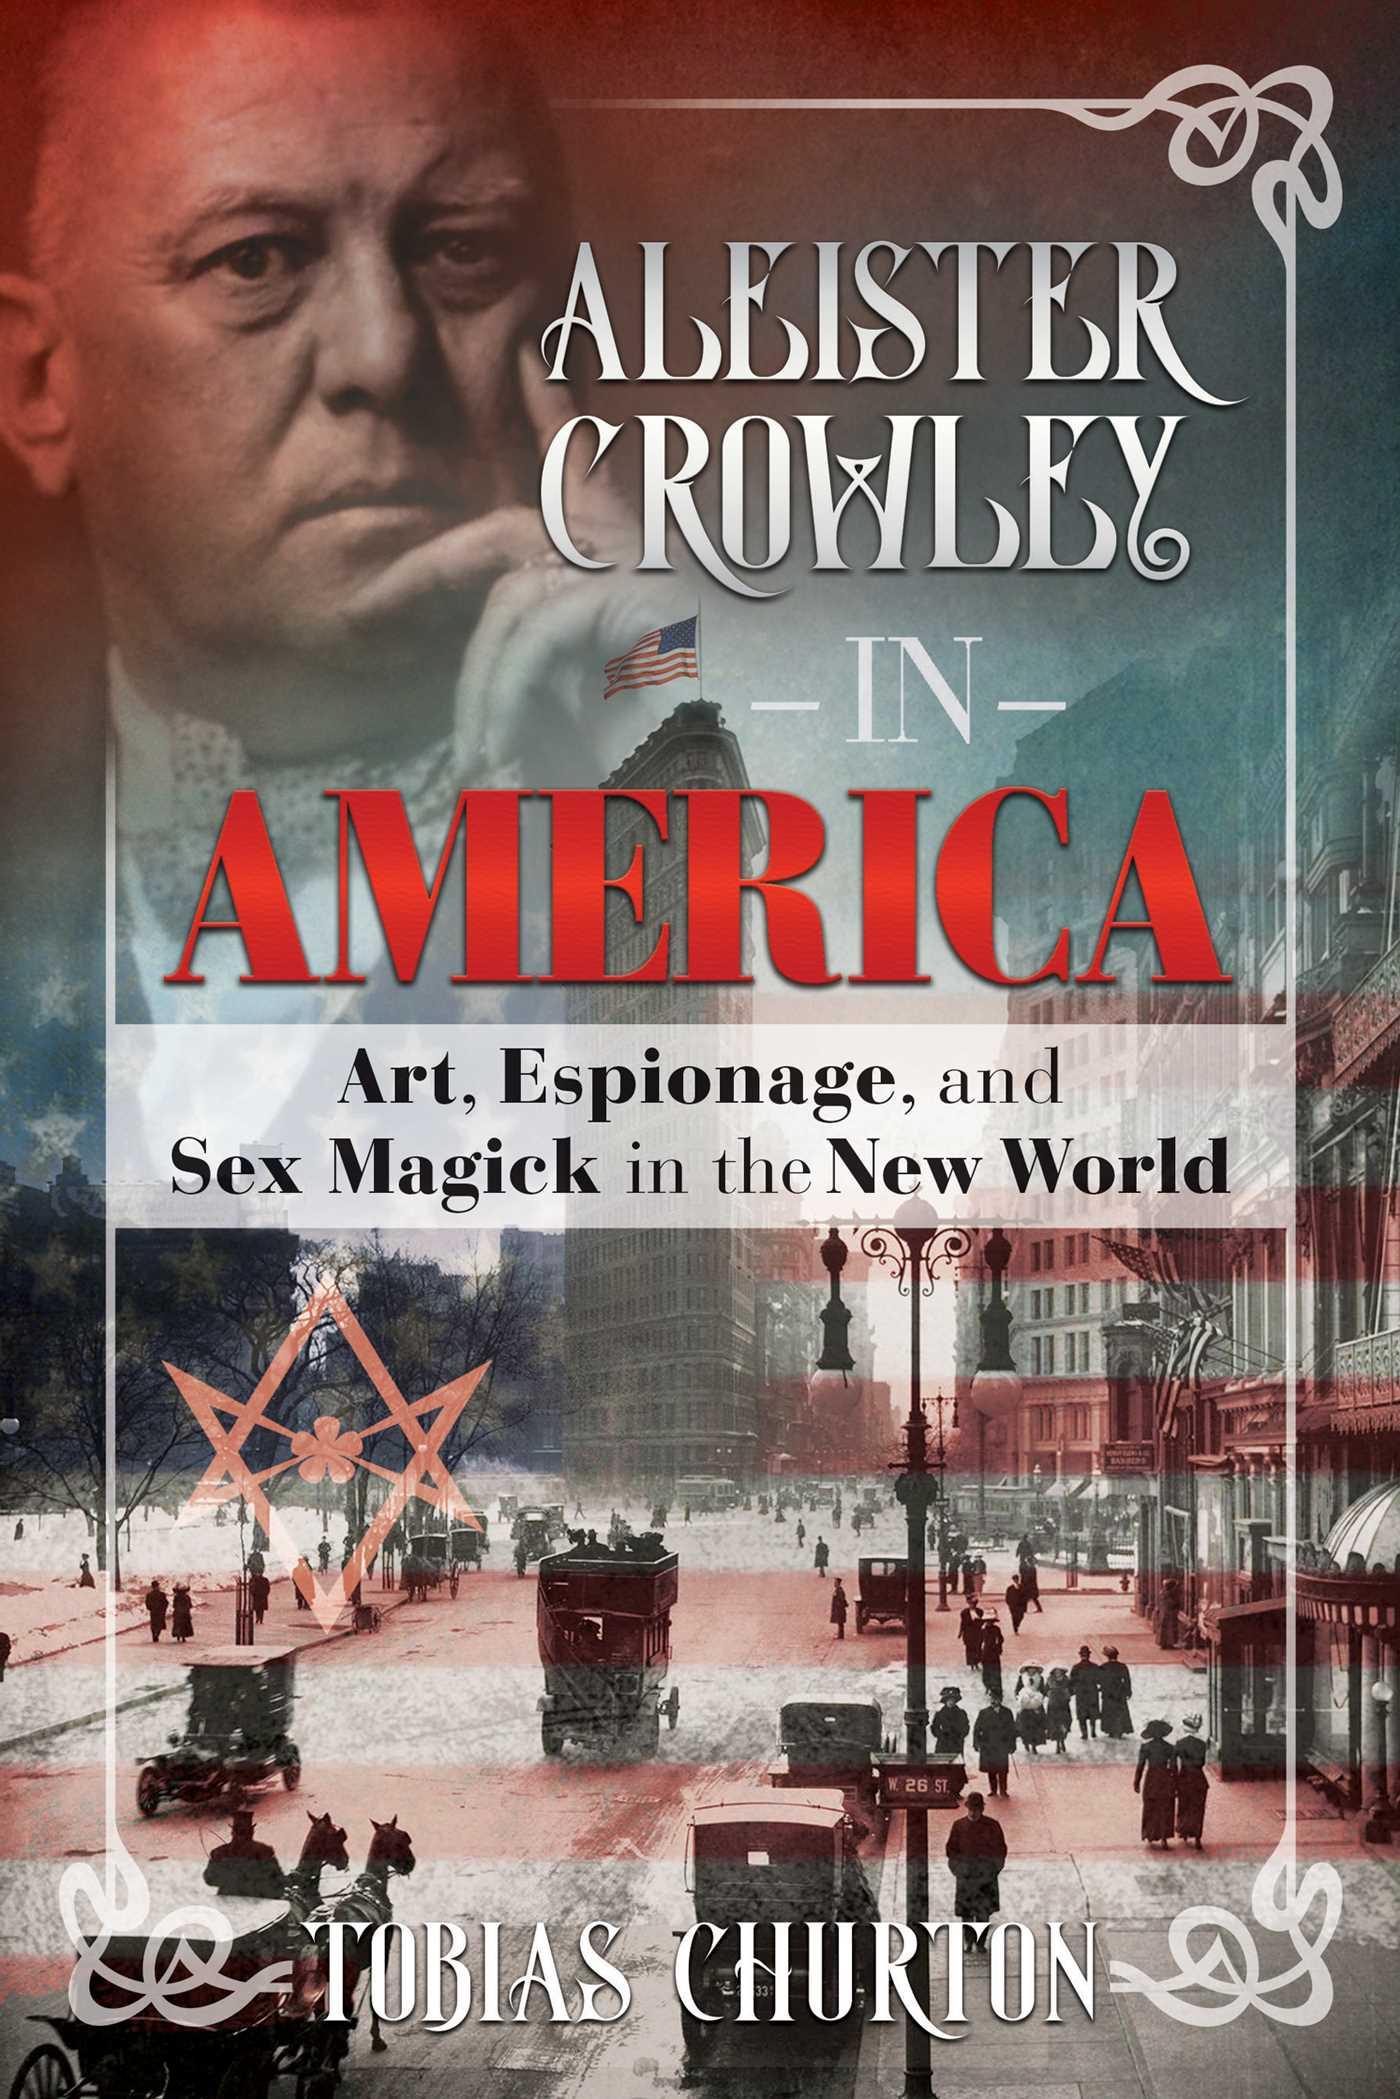 Aleister crowley in america 9781620556313 hr